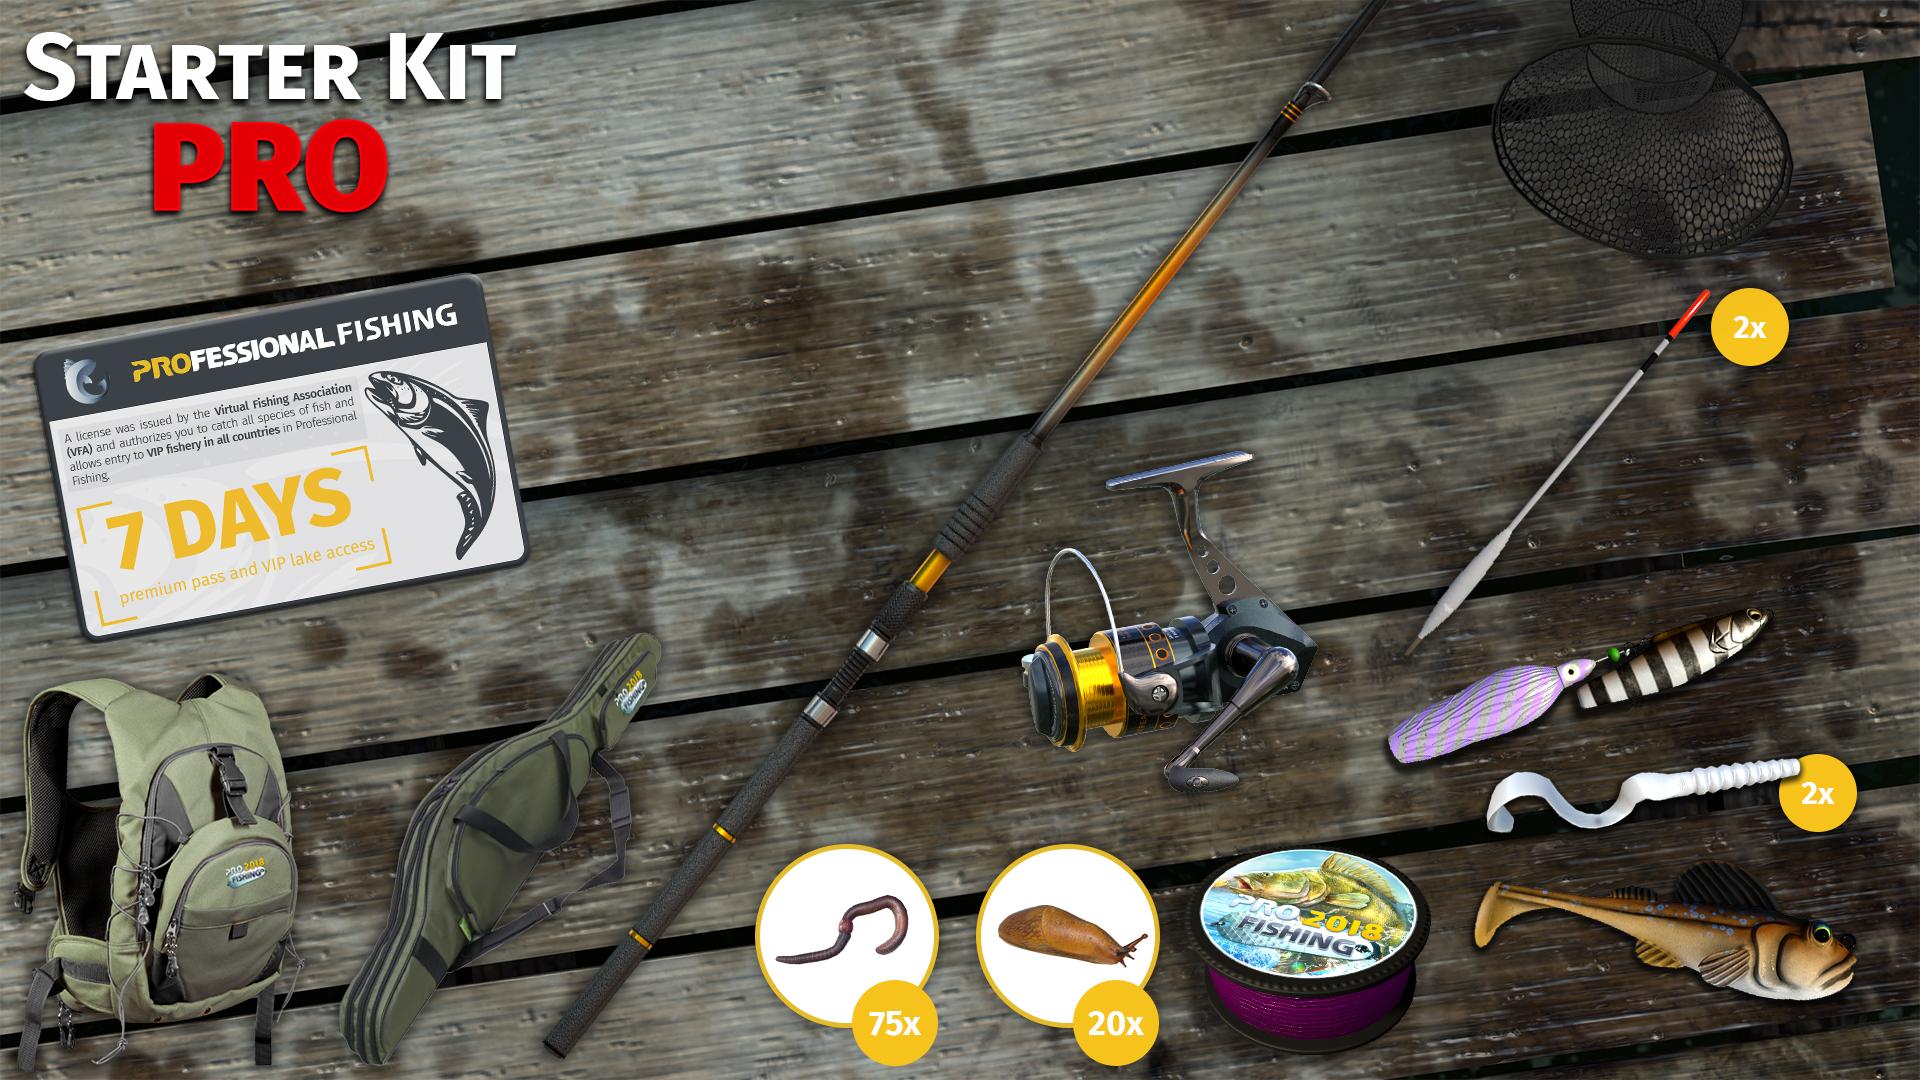 KHAiHOM.com - Professional Fishing: Starter Kit Pro